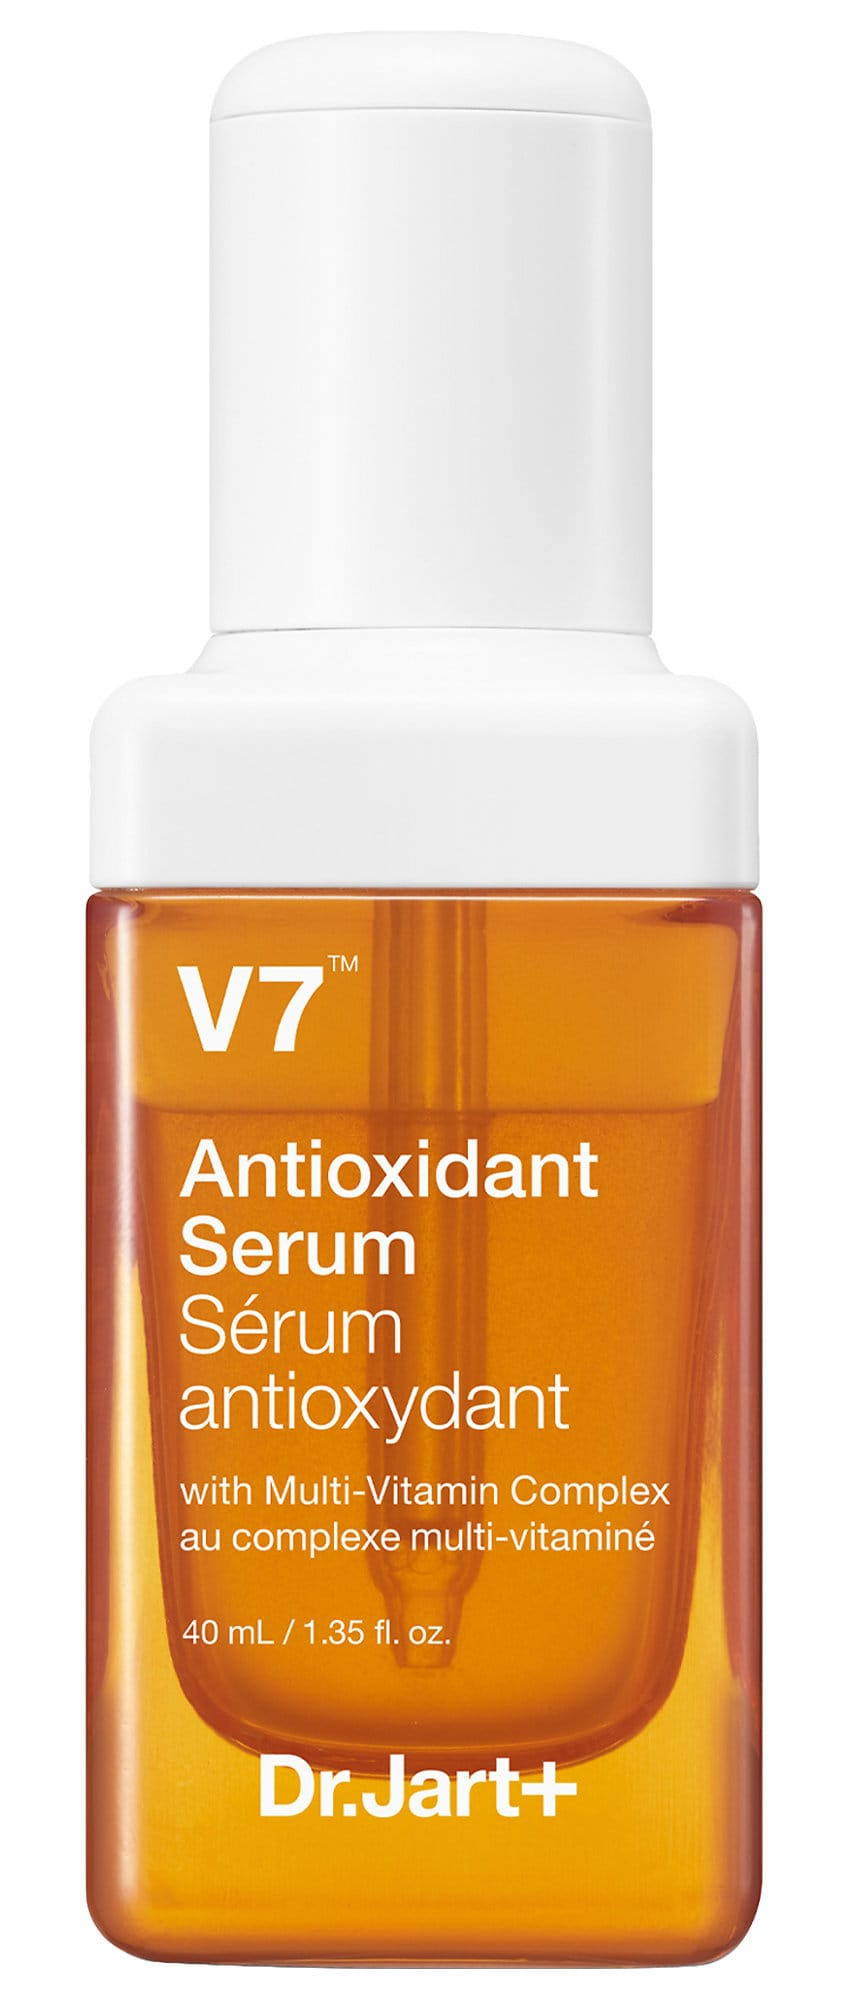 Dr. Jart+ V7 Antioxidant Serum